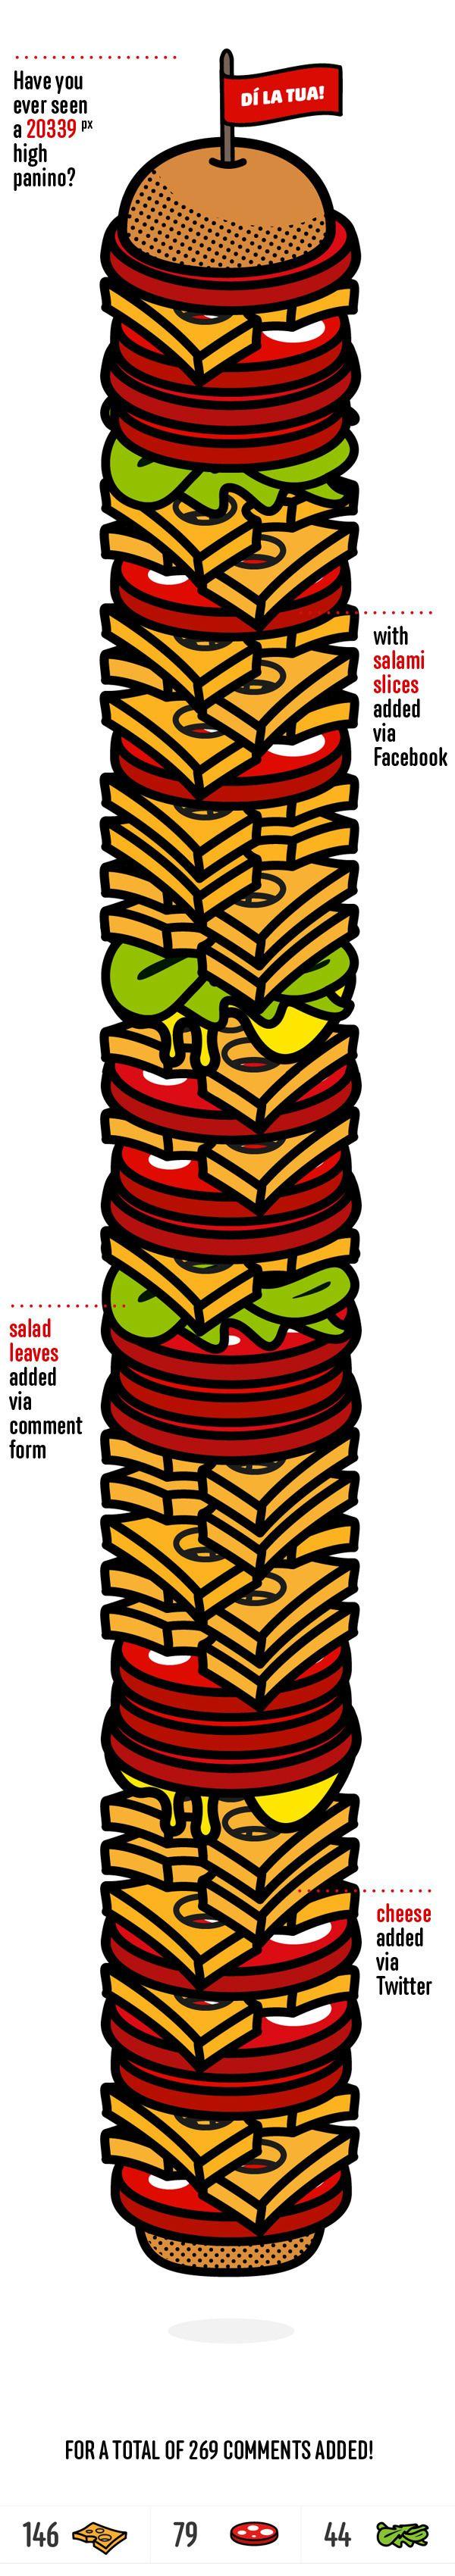 #PWES3 - Pane, Web e Salame by Gummy Industries , via Behance